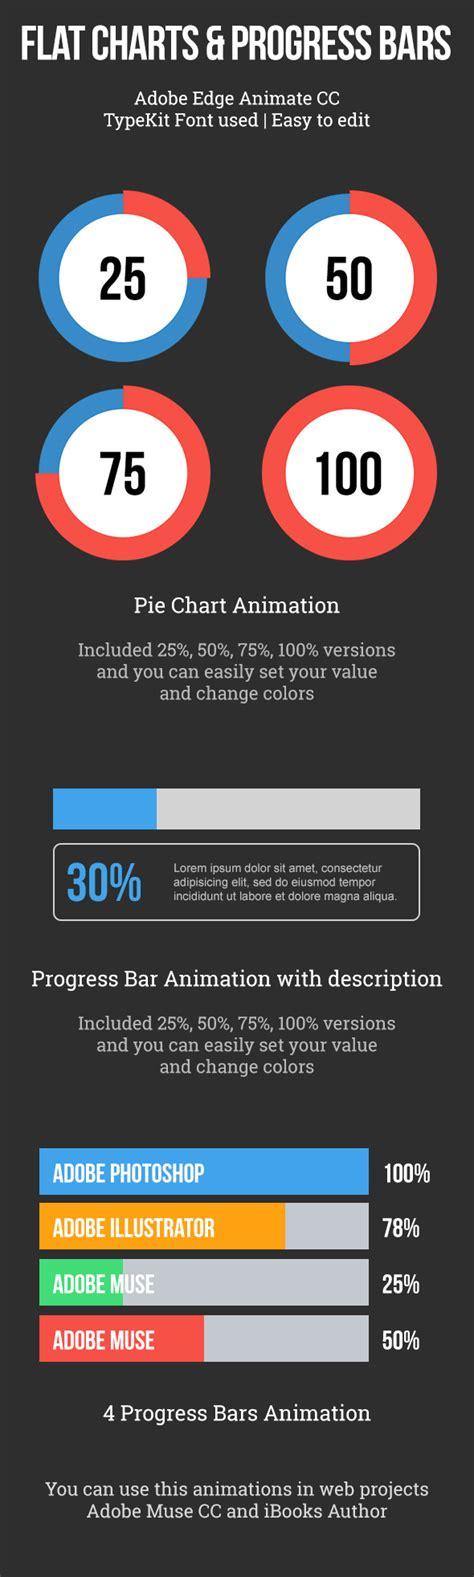 codecanyon templates flat pie charts and progress bars templates by vinyljunkie